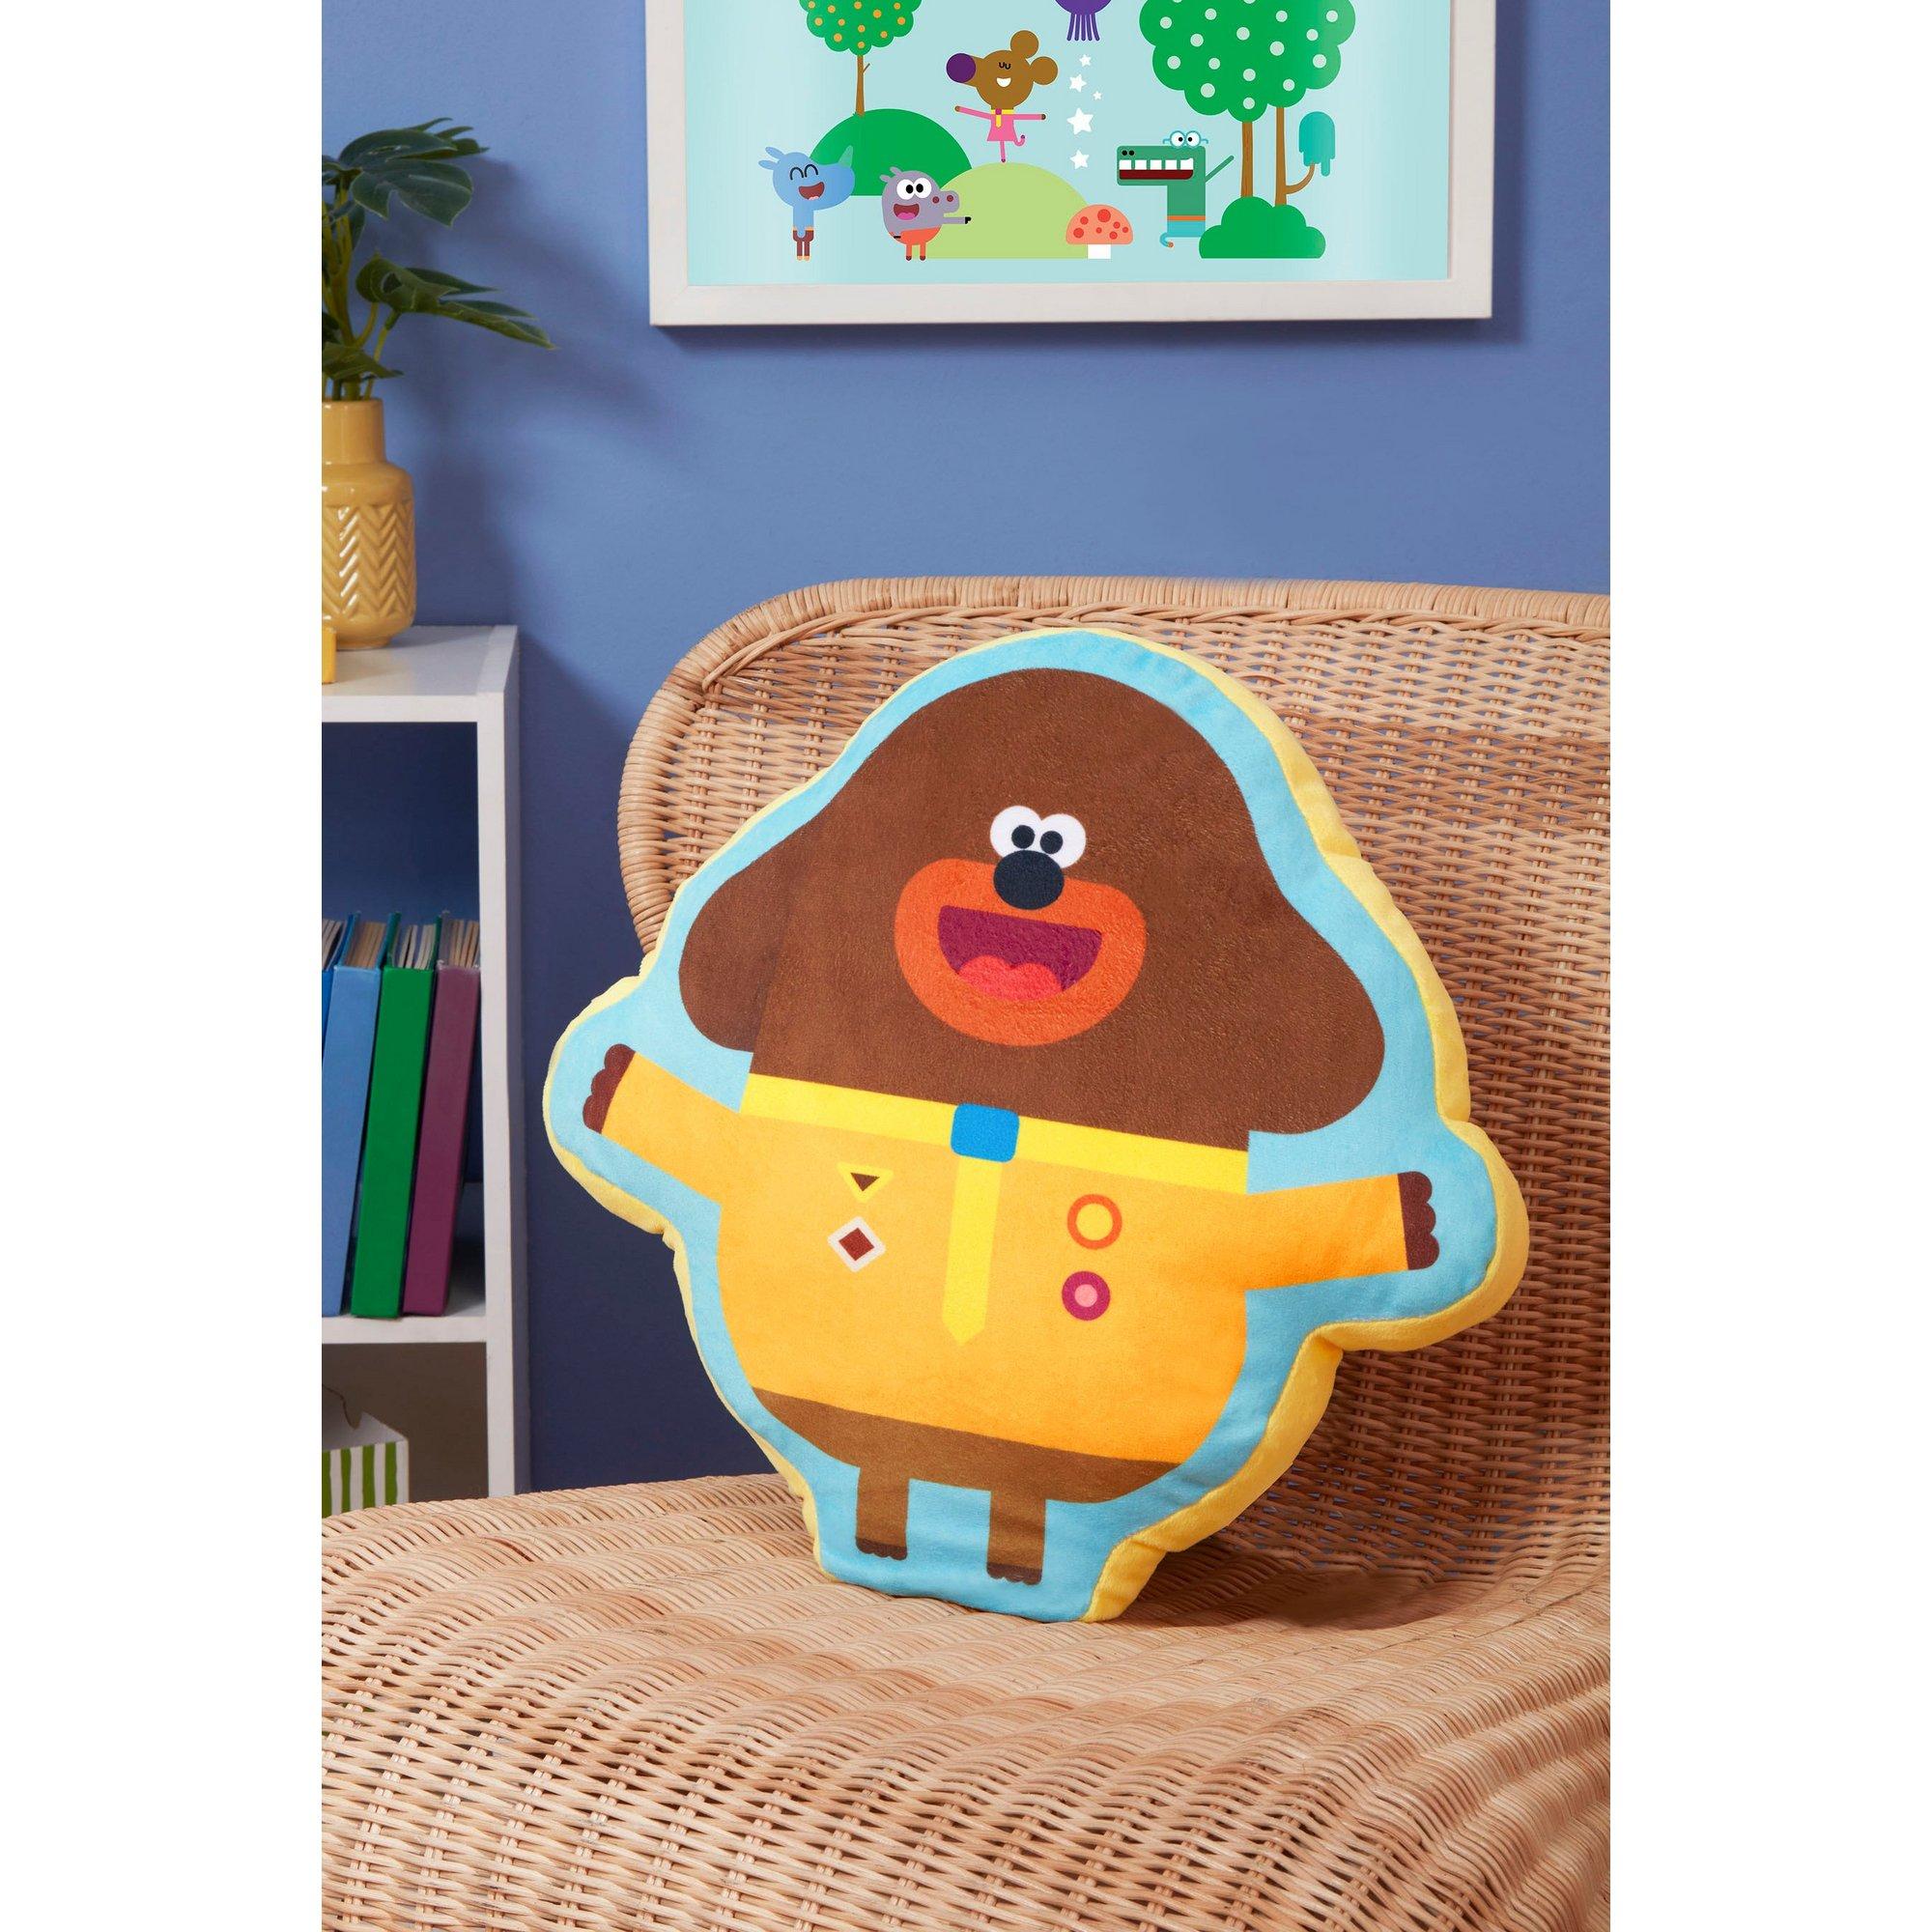 Image of Hey Duggee Shaped Cushion